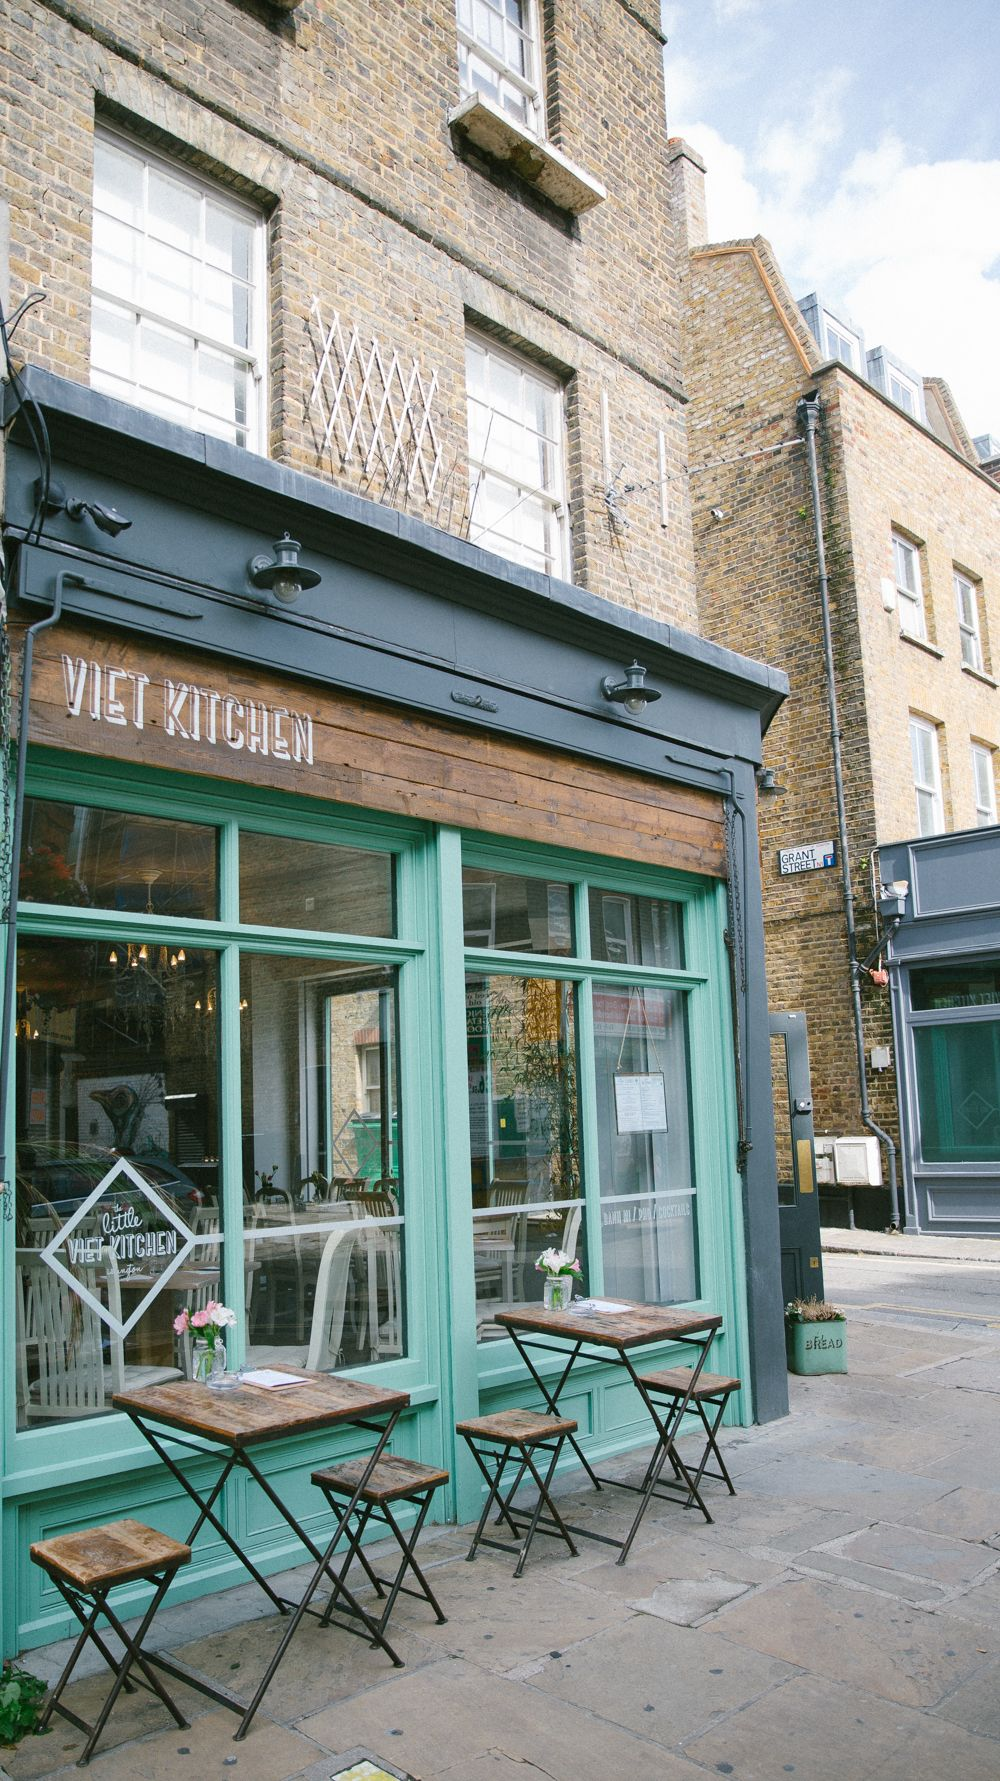 Little Viet Kitchen, The Londoner   Retail Inspiration   Pinterest ...